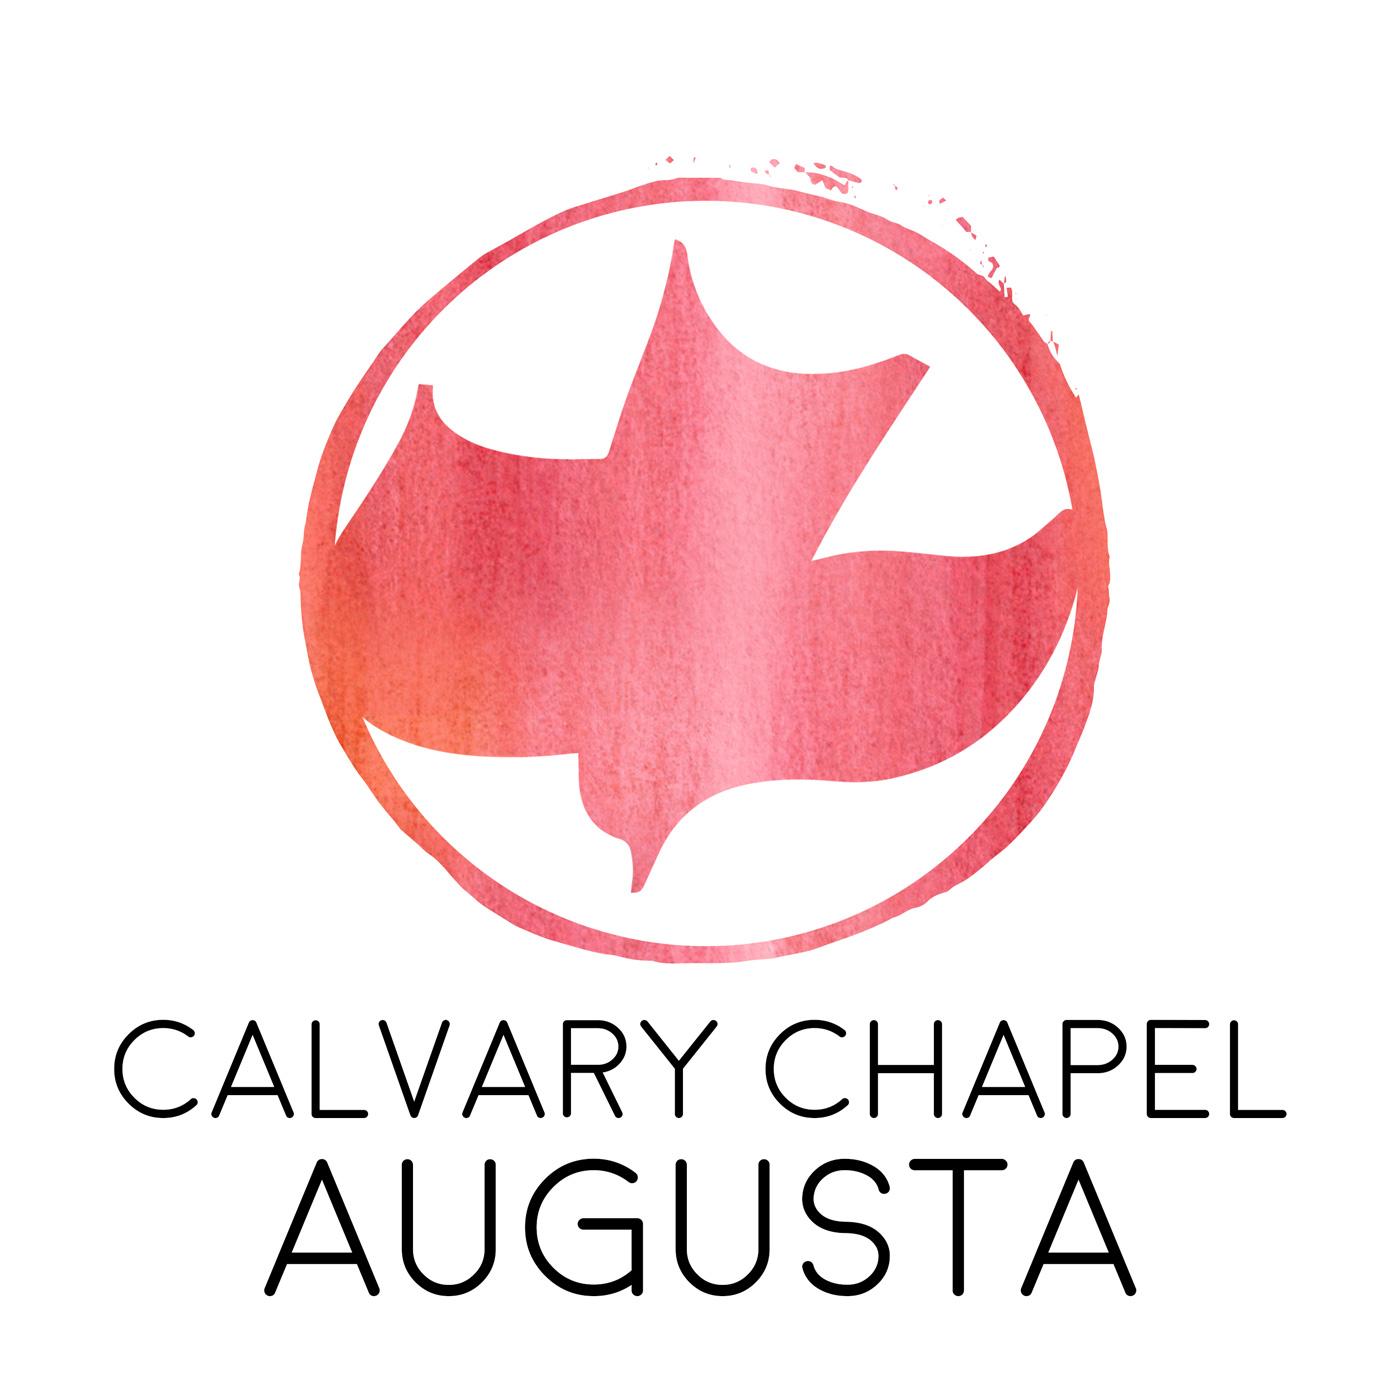 Calvary Chapel Augusta